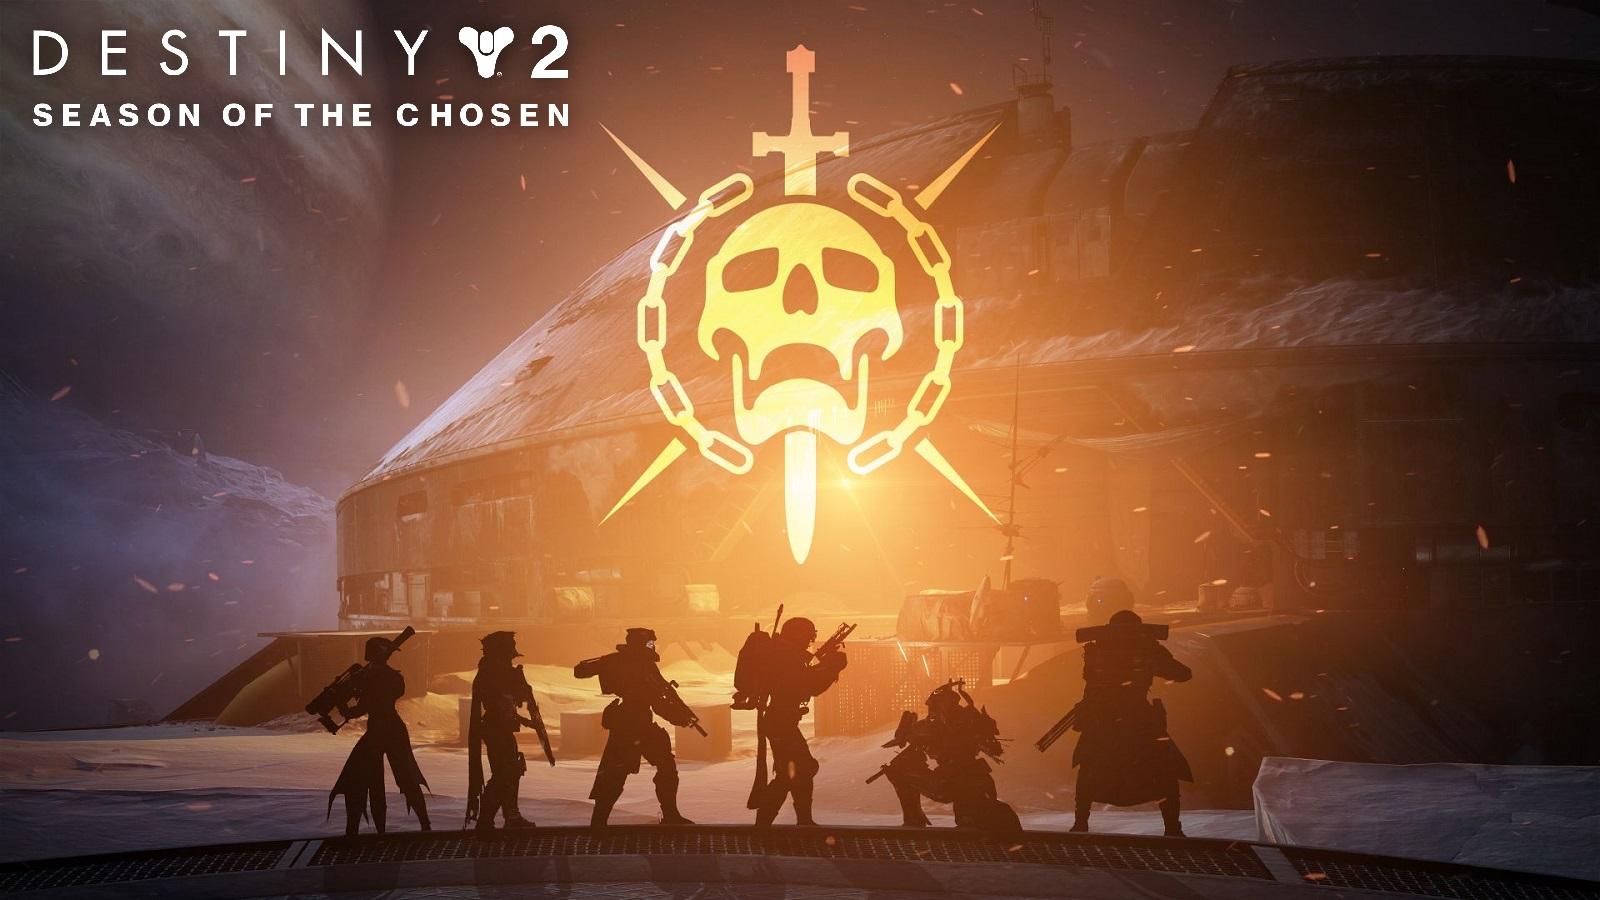 Destiny 2 Deep Stone Crypt Guardians With Raid Logo Season of the Chosen Text